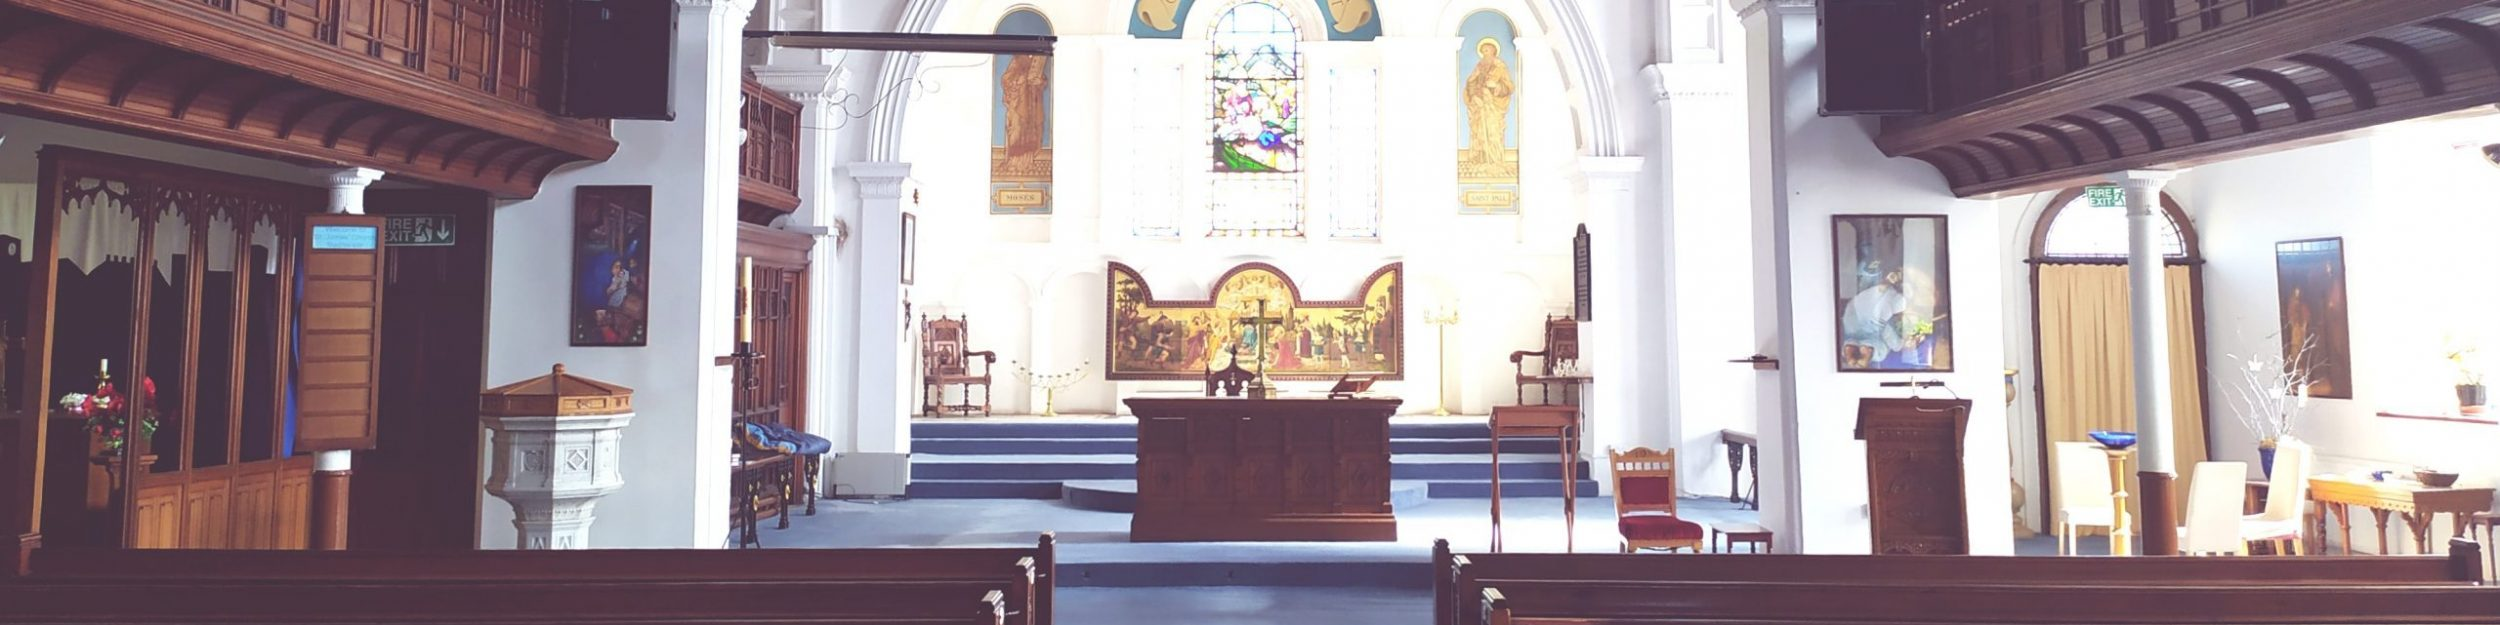 The Church of England in Marsden and Slaithwaite